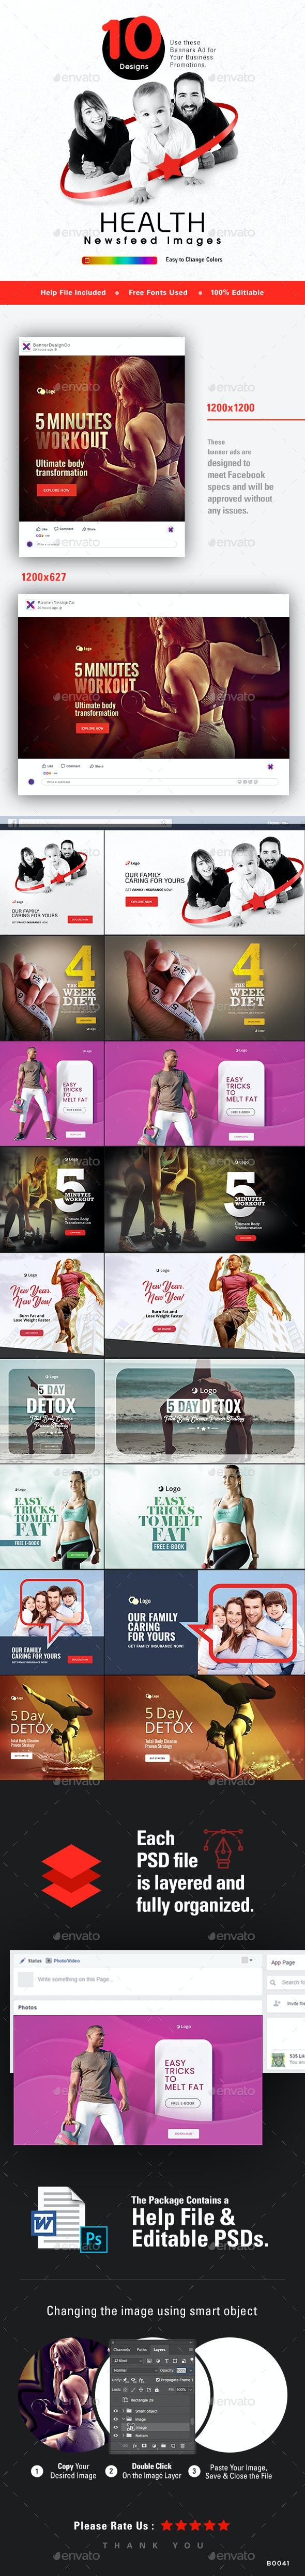 Health Social Media Banner Set - 10 Designs  - 20 Banners - Miscellaneous Social Media